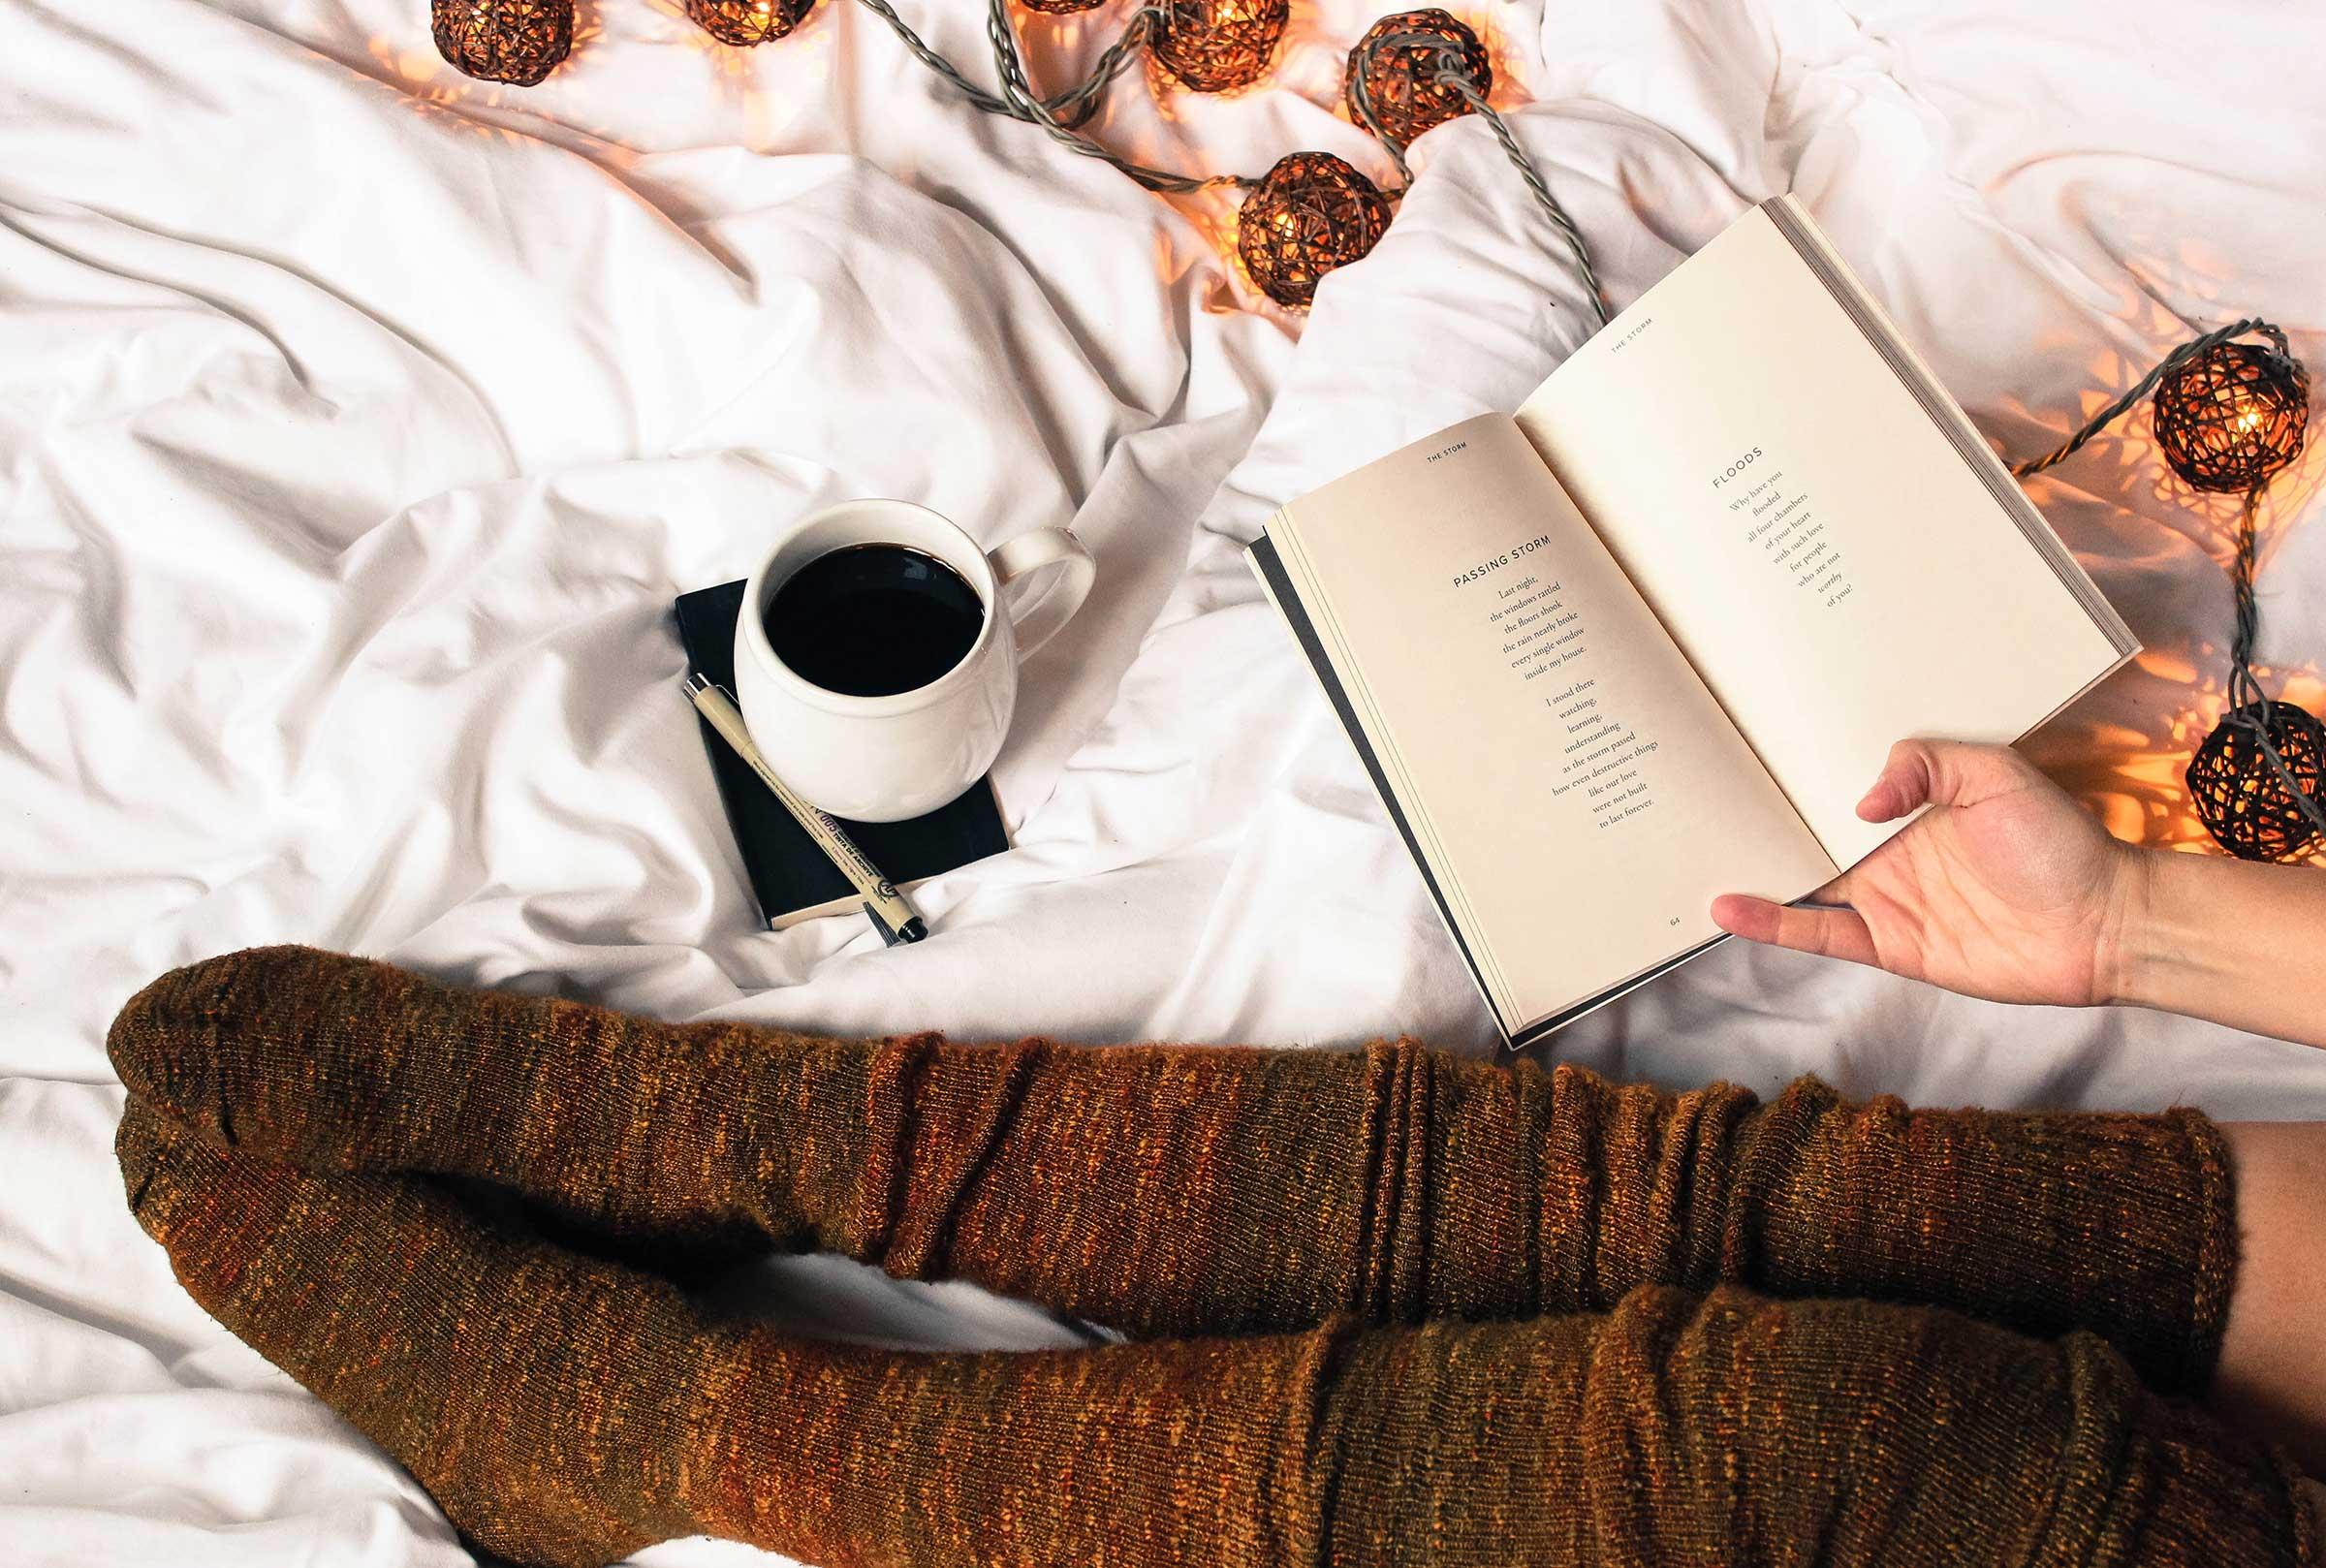 les-naly-woman-reading-best-books-career-work-2.jpg